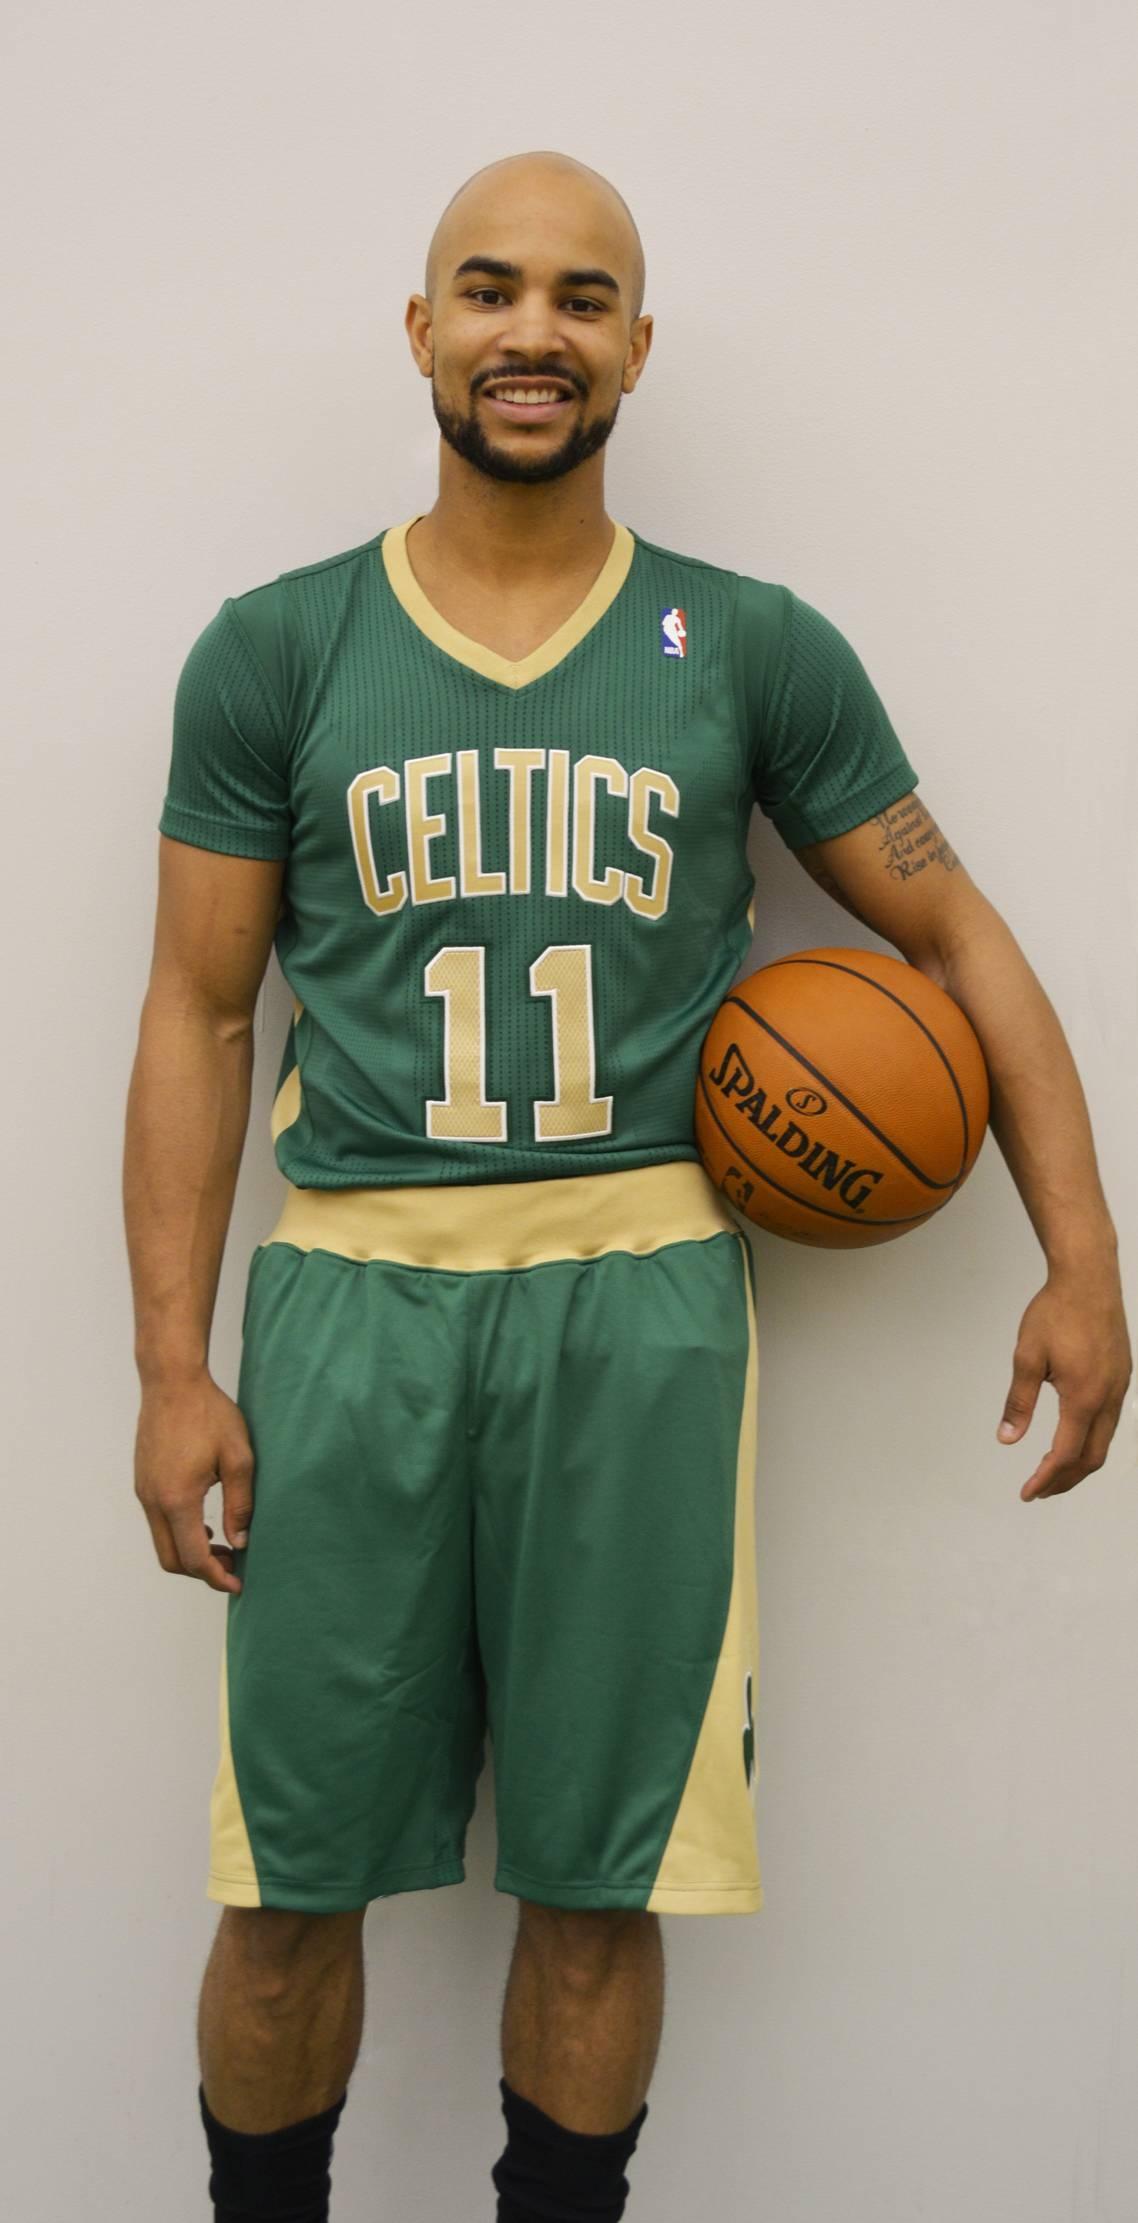 Celtics introduce sleeved St. Patrick s jerseys -Celtics blog ... a434d8d40